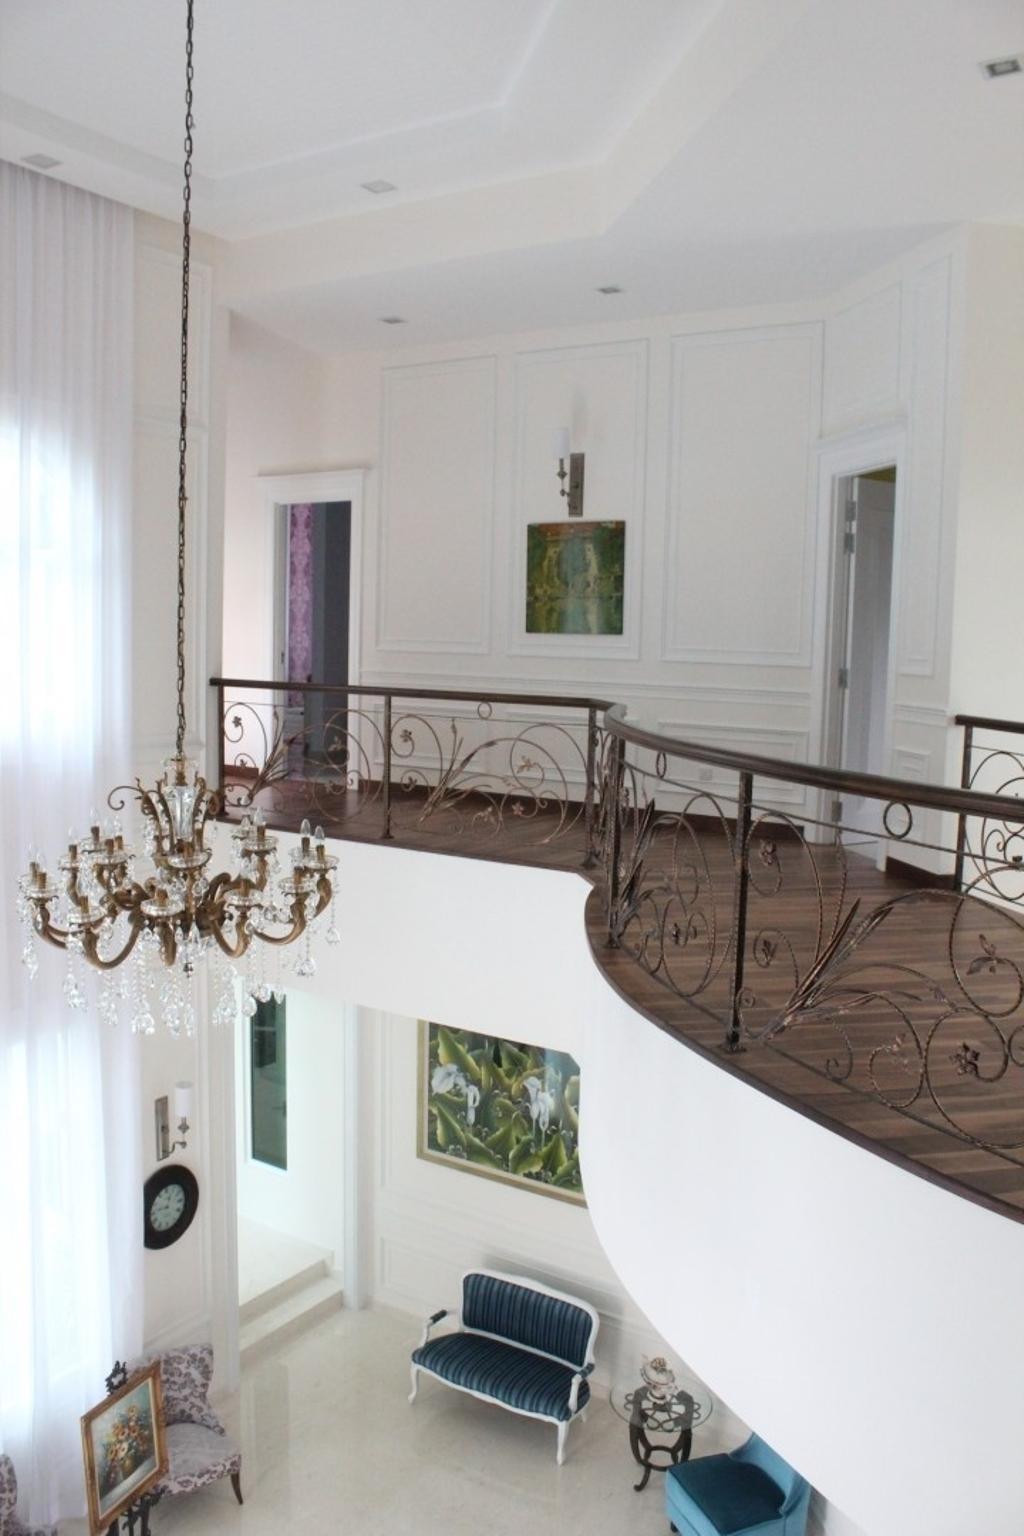 Vintage, Landed, Balcony, Saujana Impian Kajang, Interior Designer, Klaasmen Sdn. Bhd., Dining Room, Indoors, Interior Design, Room, Banister, Handrail, Staircase